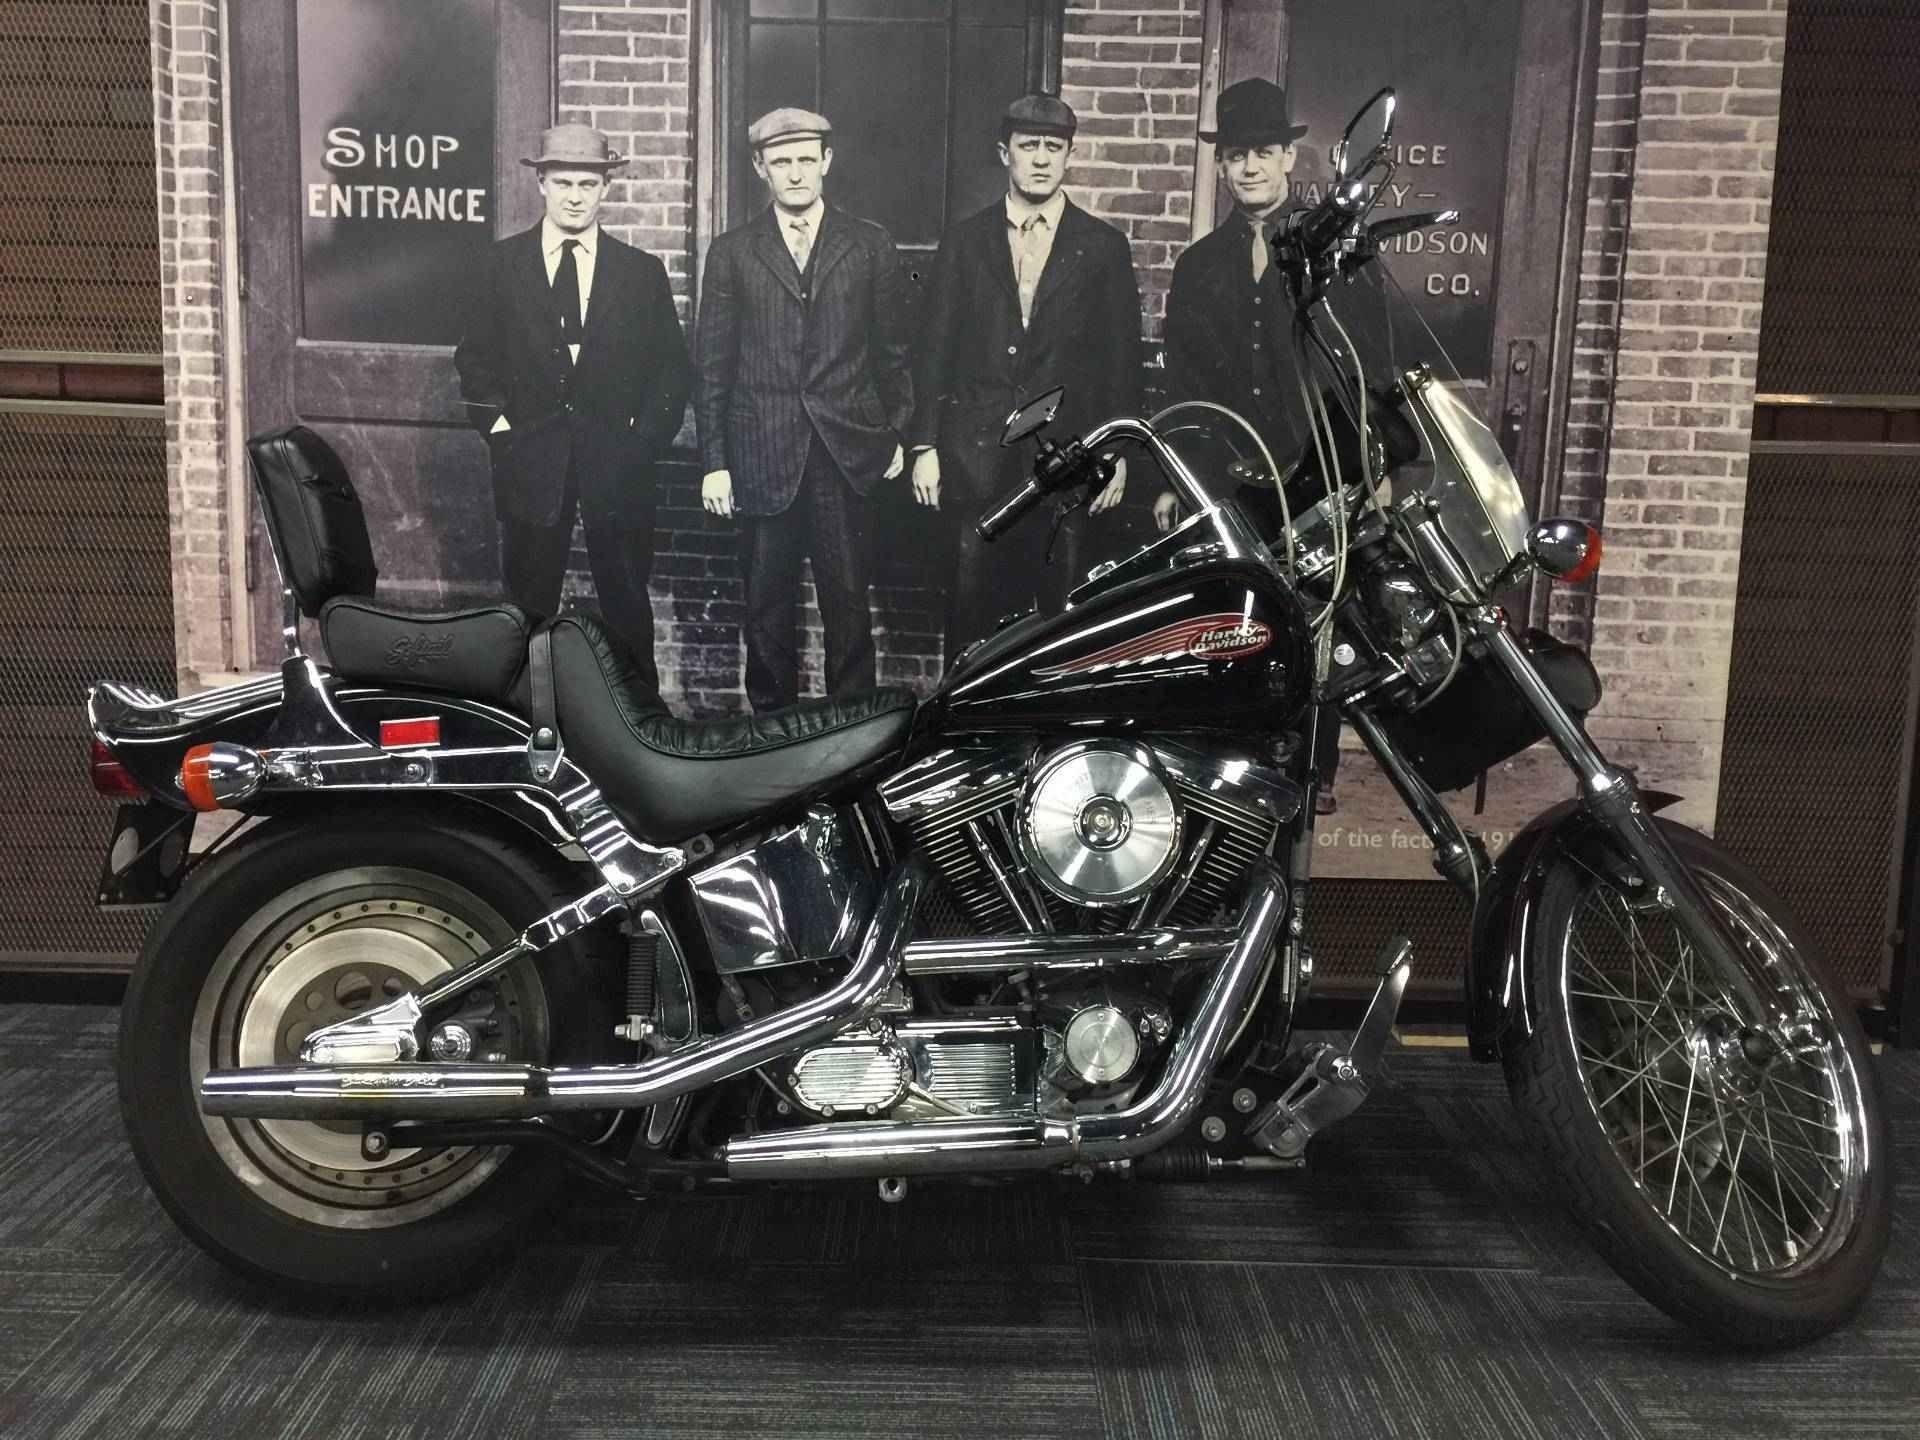 1999 Harley Davidson Fxstc Softaila Custom Softail Custom Harley Davidson Harley Davidson Museum [ 1440 x 1920 Pixel ]